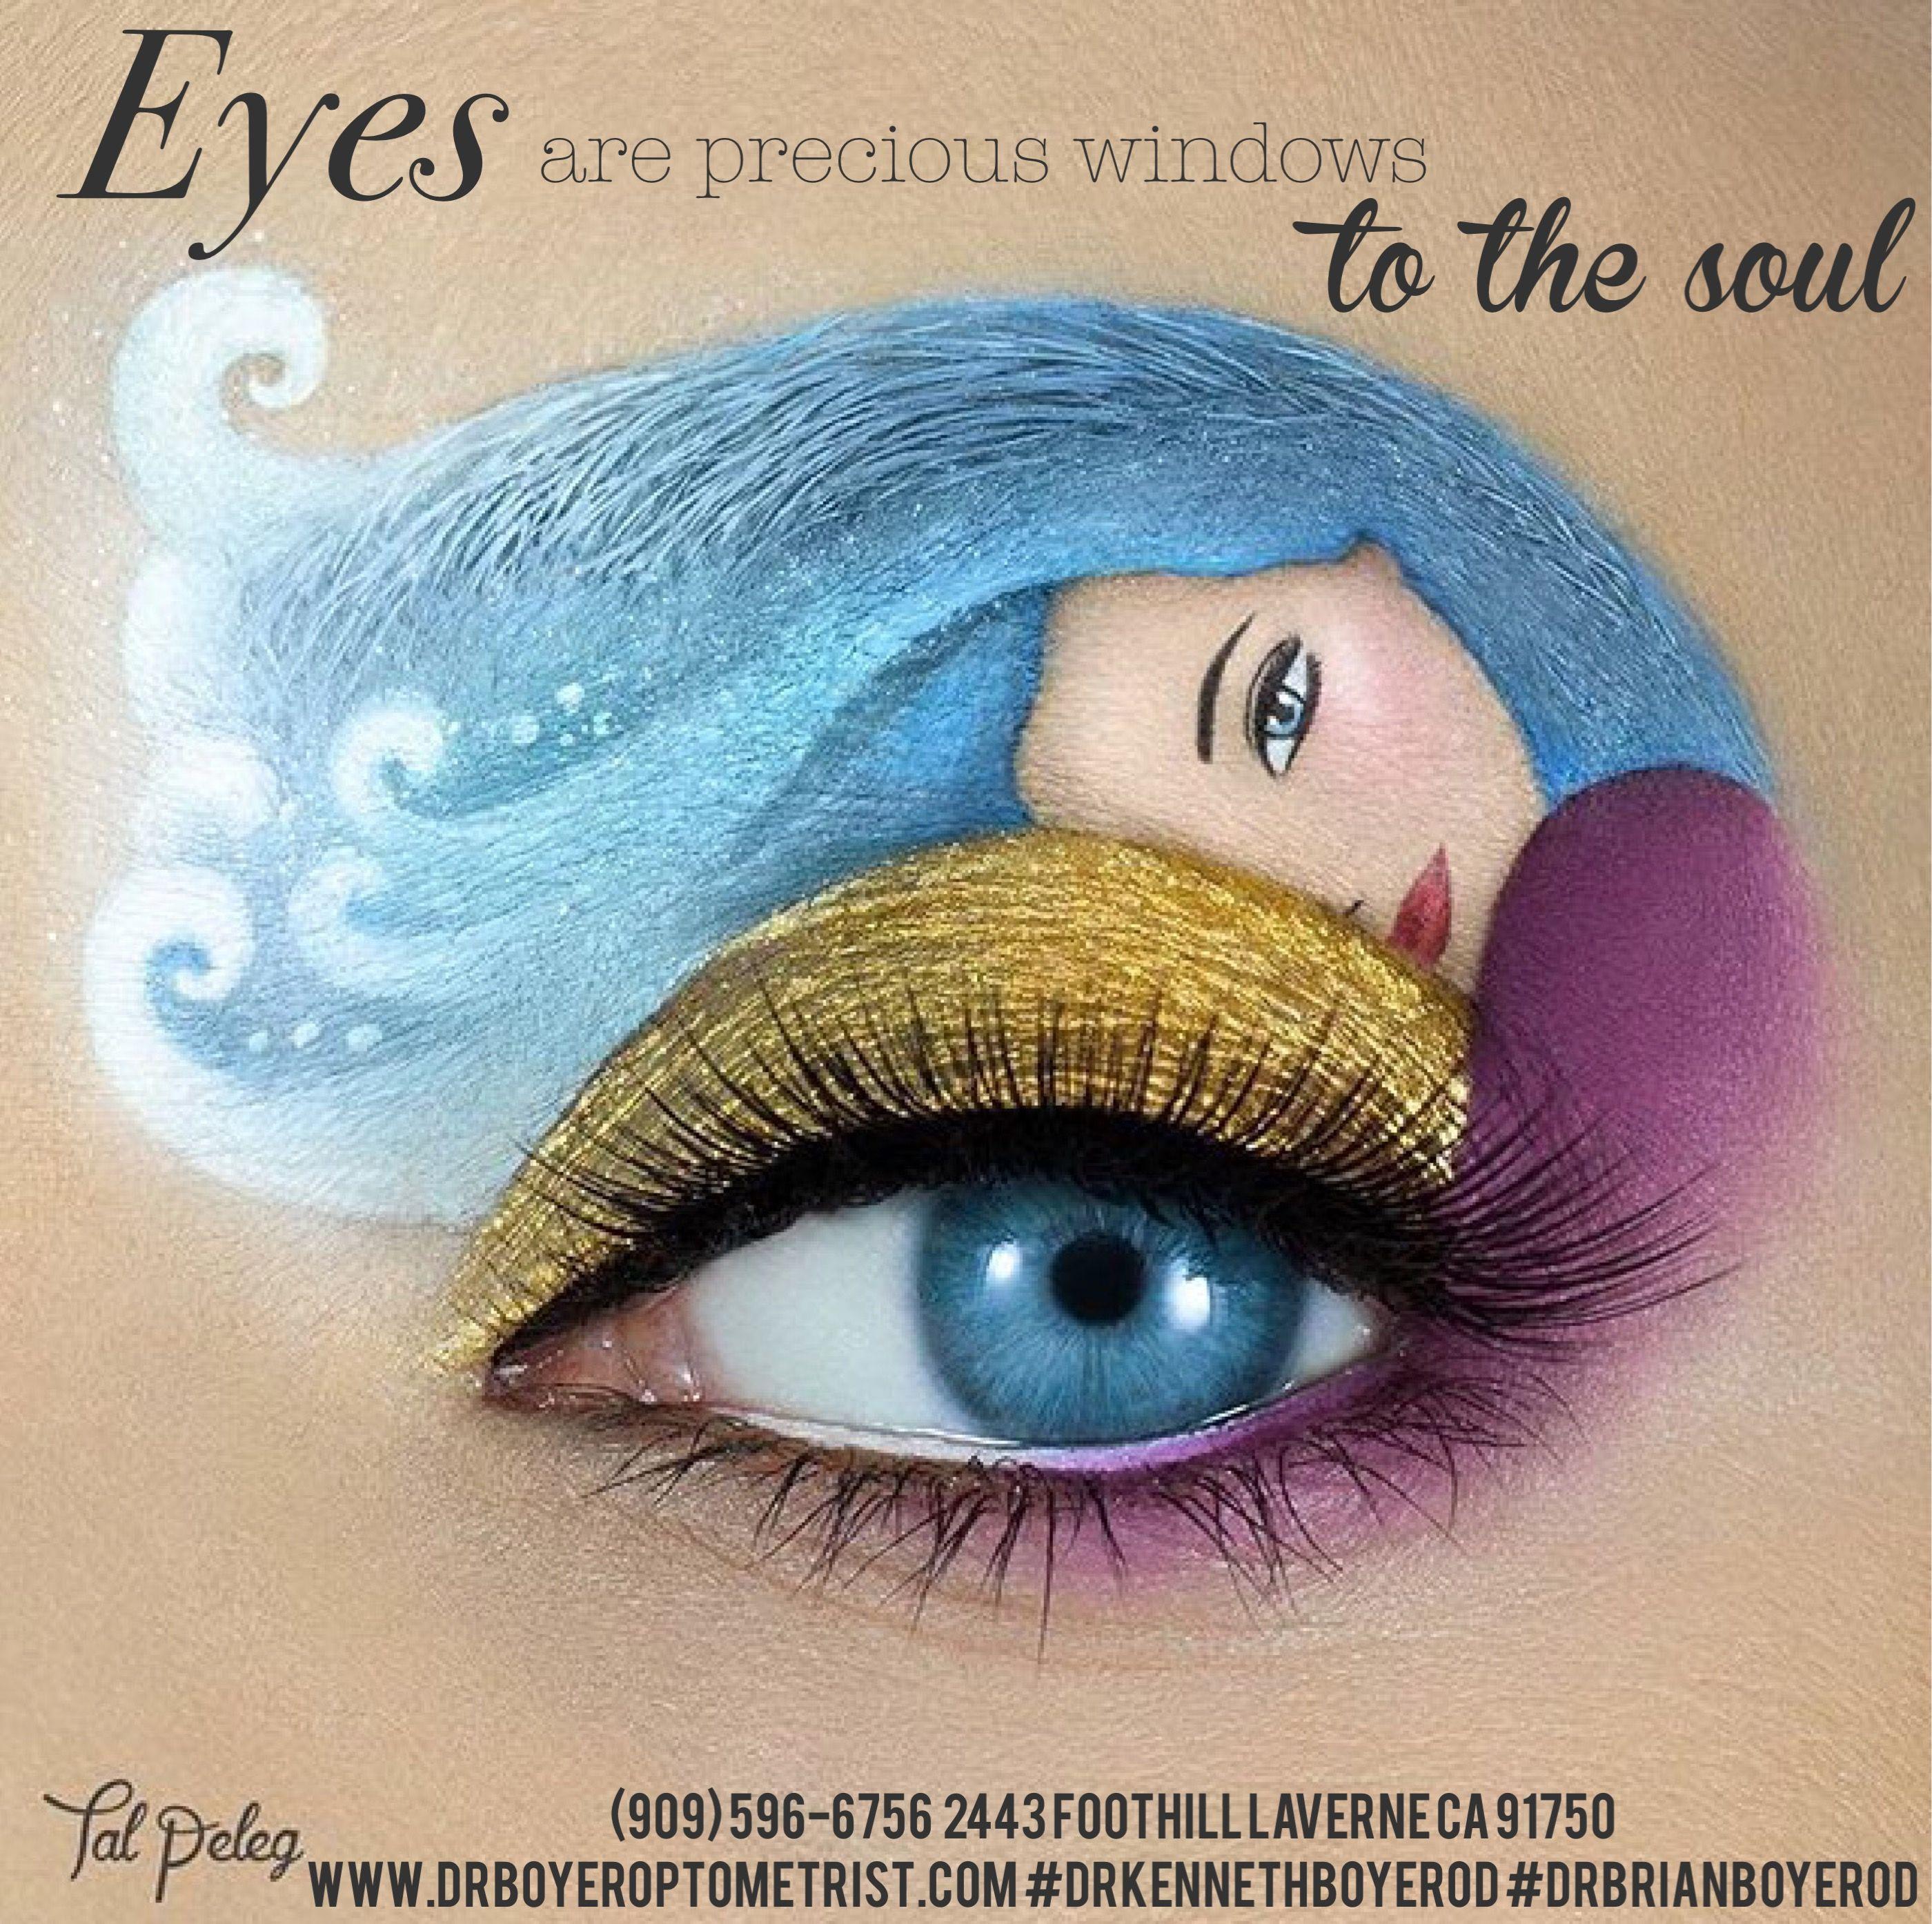 Take Good Care Of Your Eyes Eyes Savvy109 909 596 6756 2443